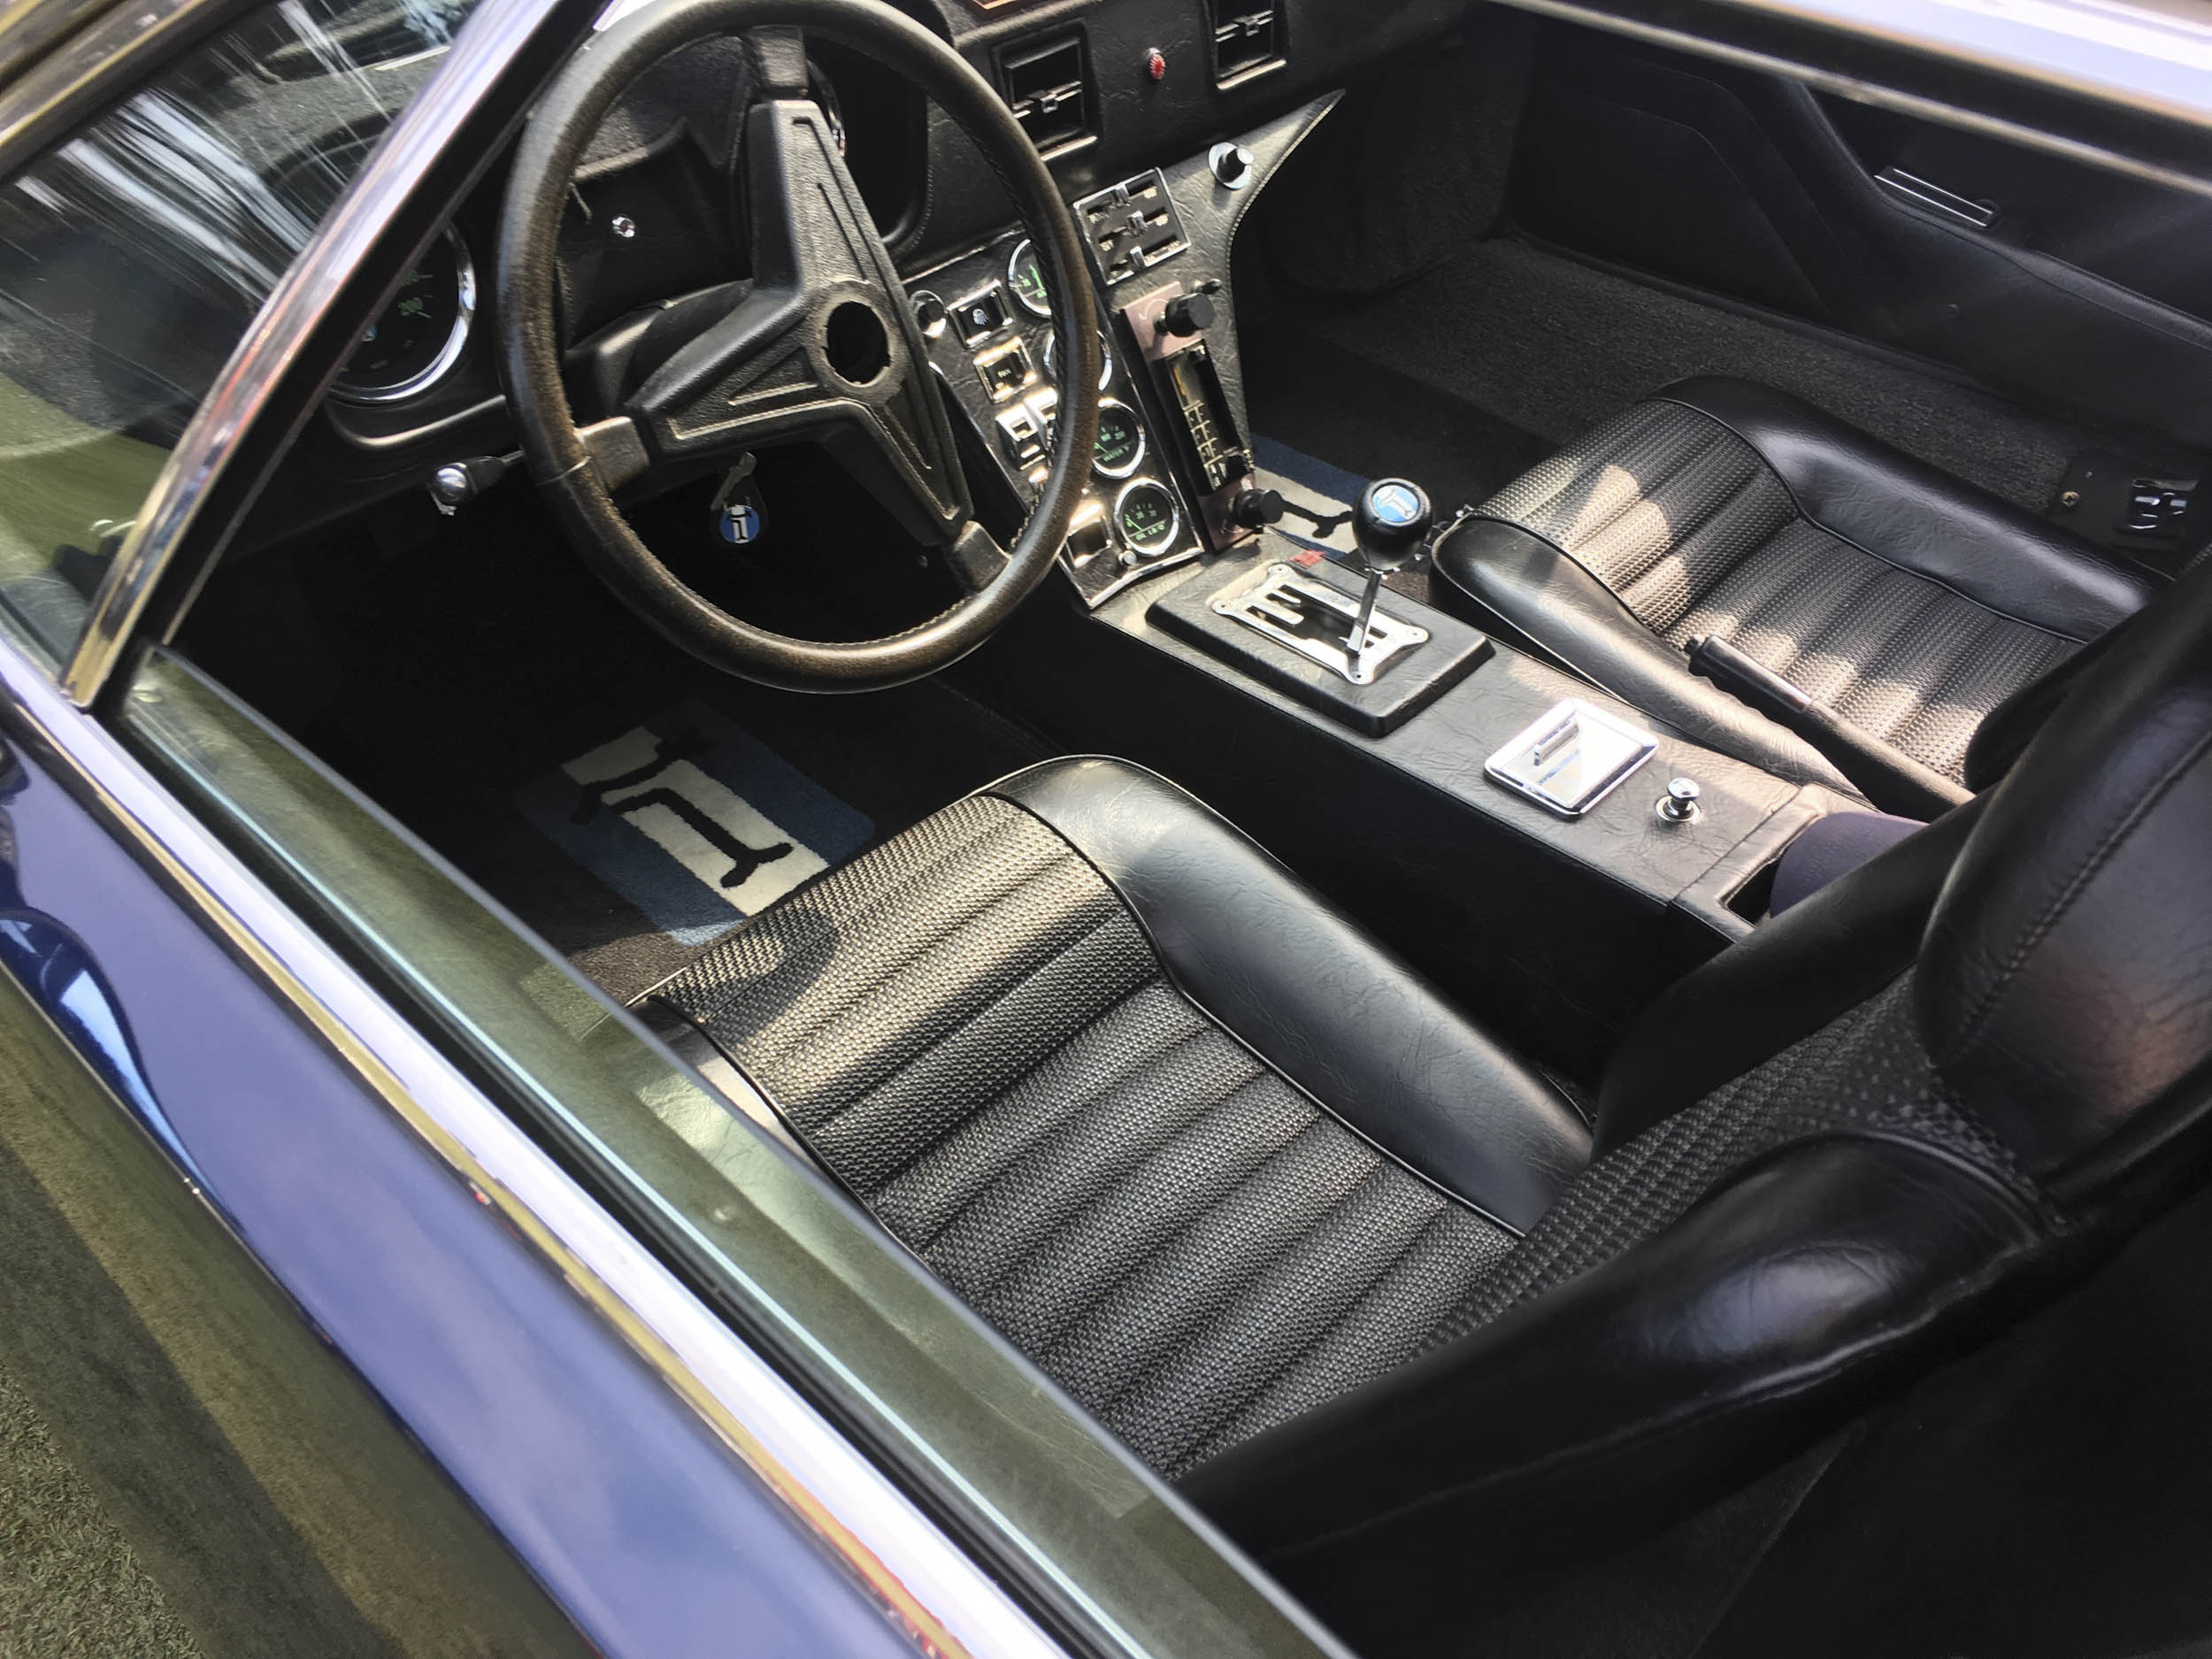 1972 DeTomaso Pantera interior